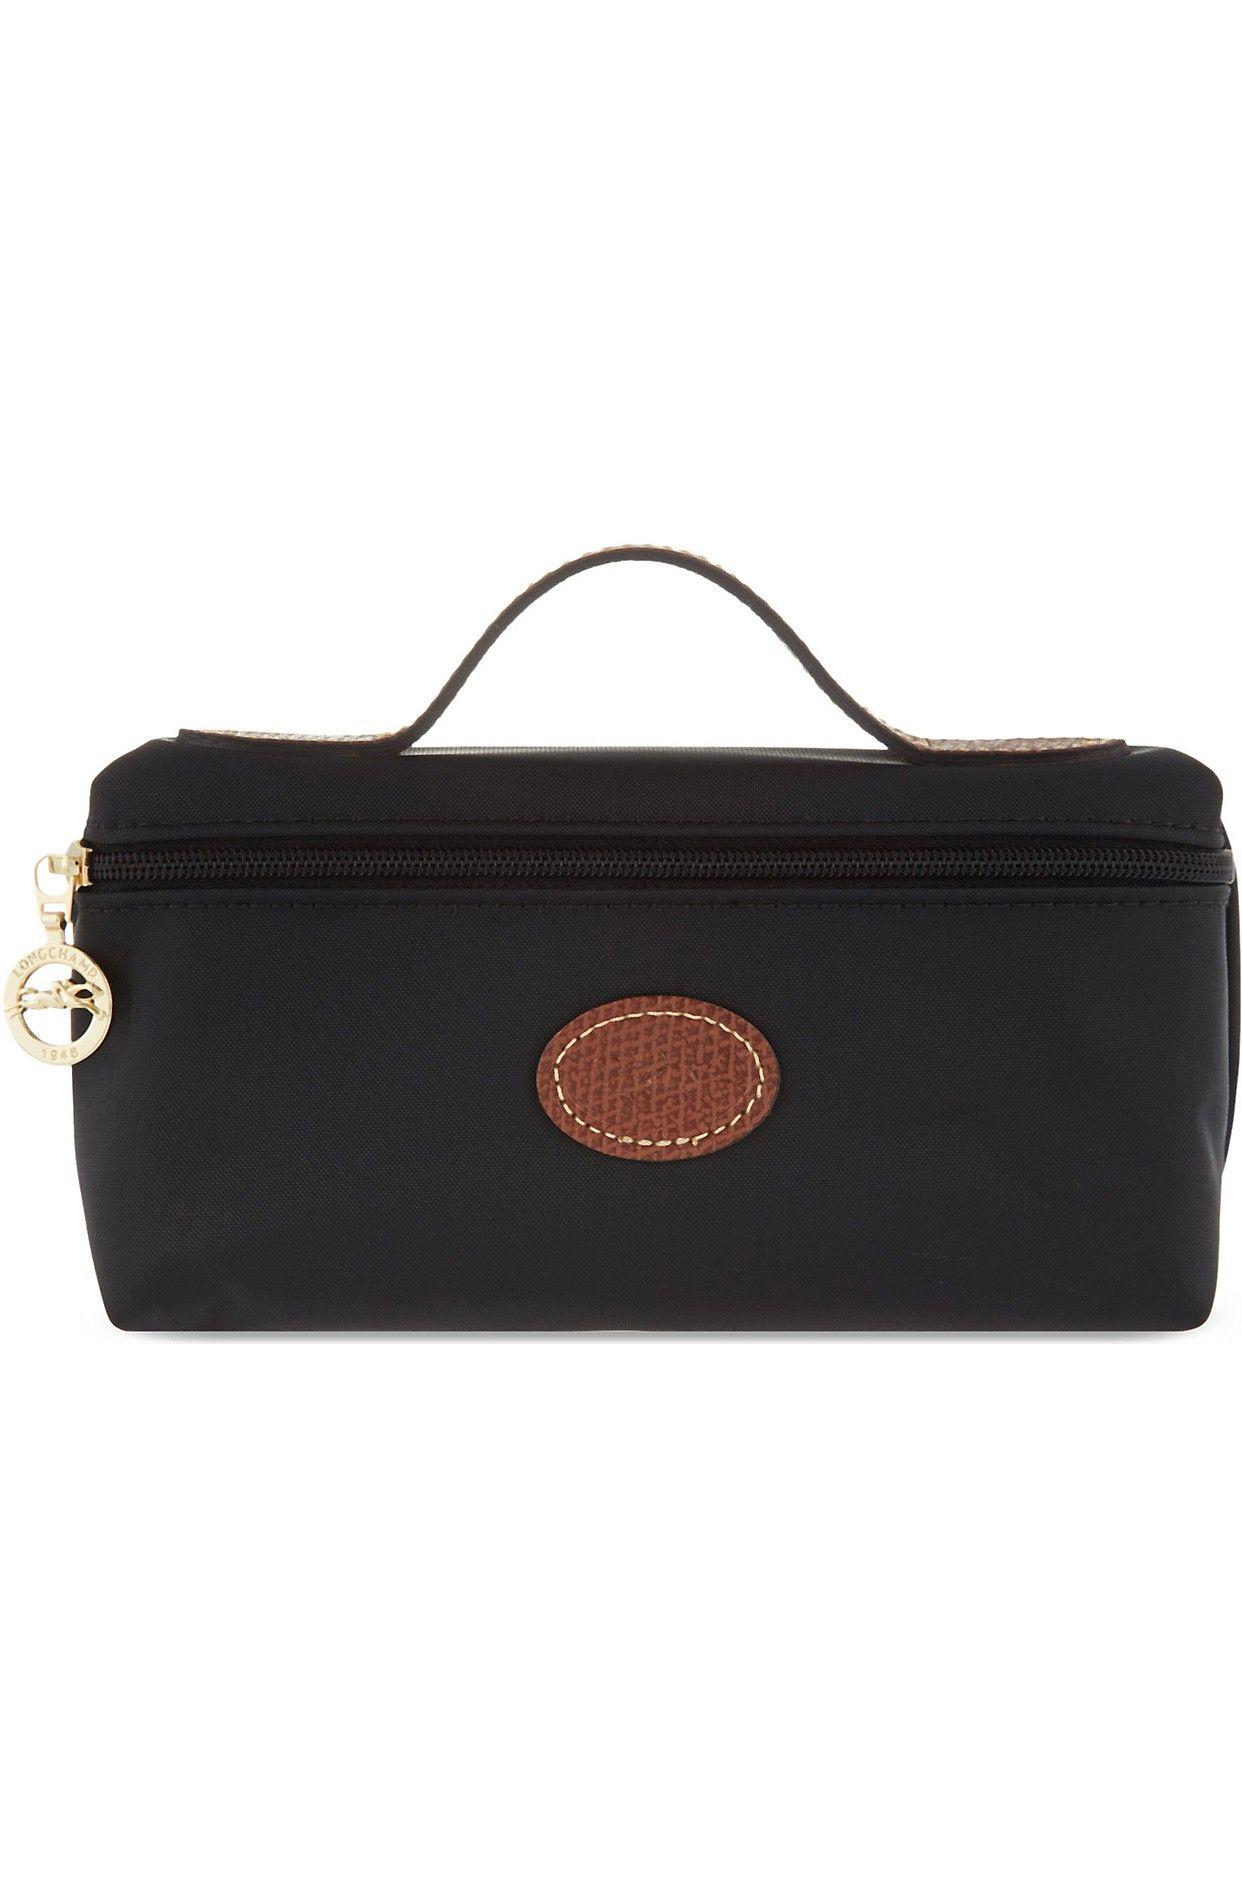 3b8b2396c445 LONGCHAMP - Le Pliage make-up bag